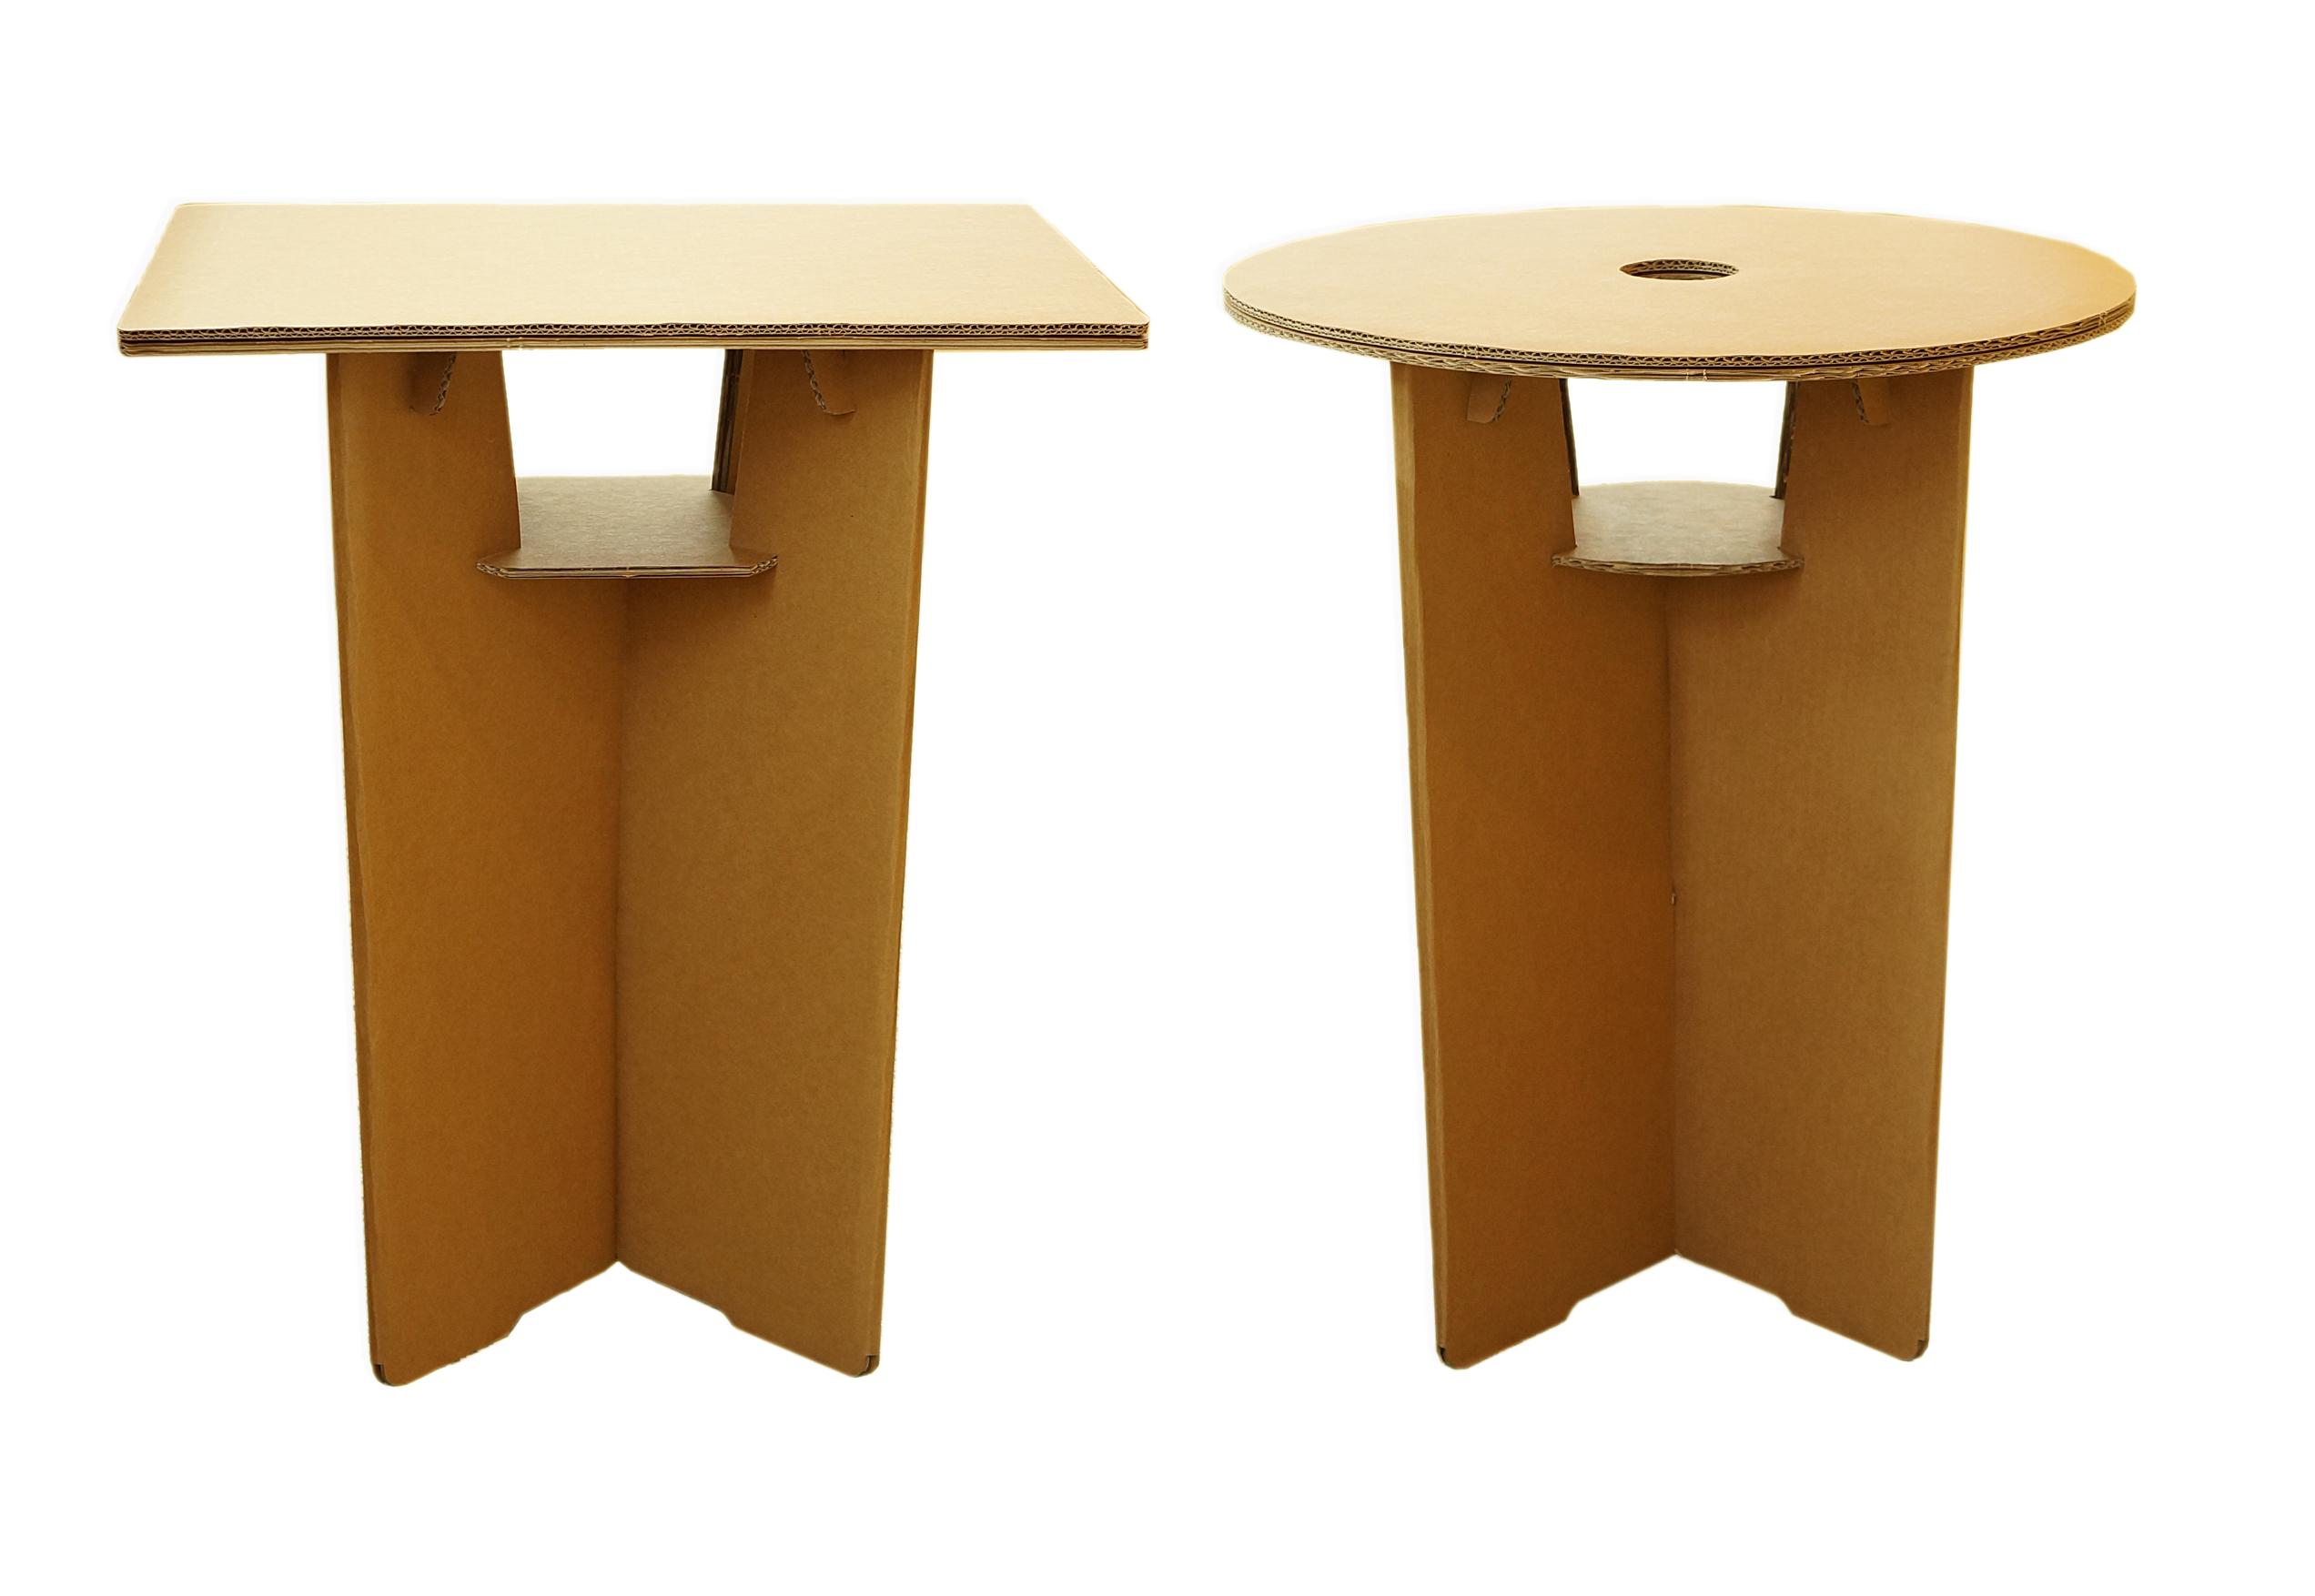 Cardboard table